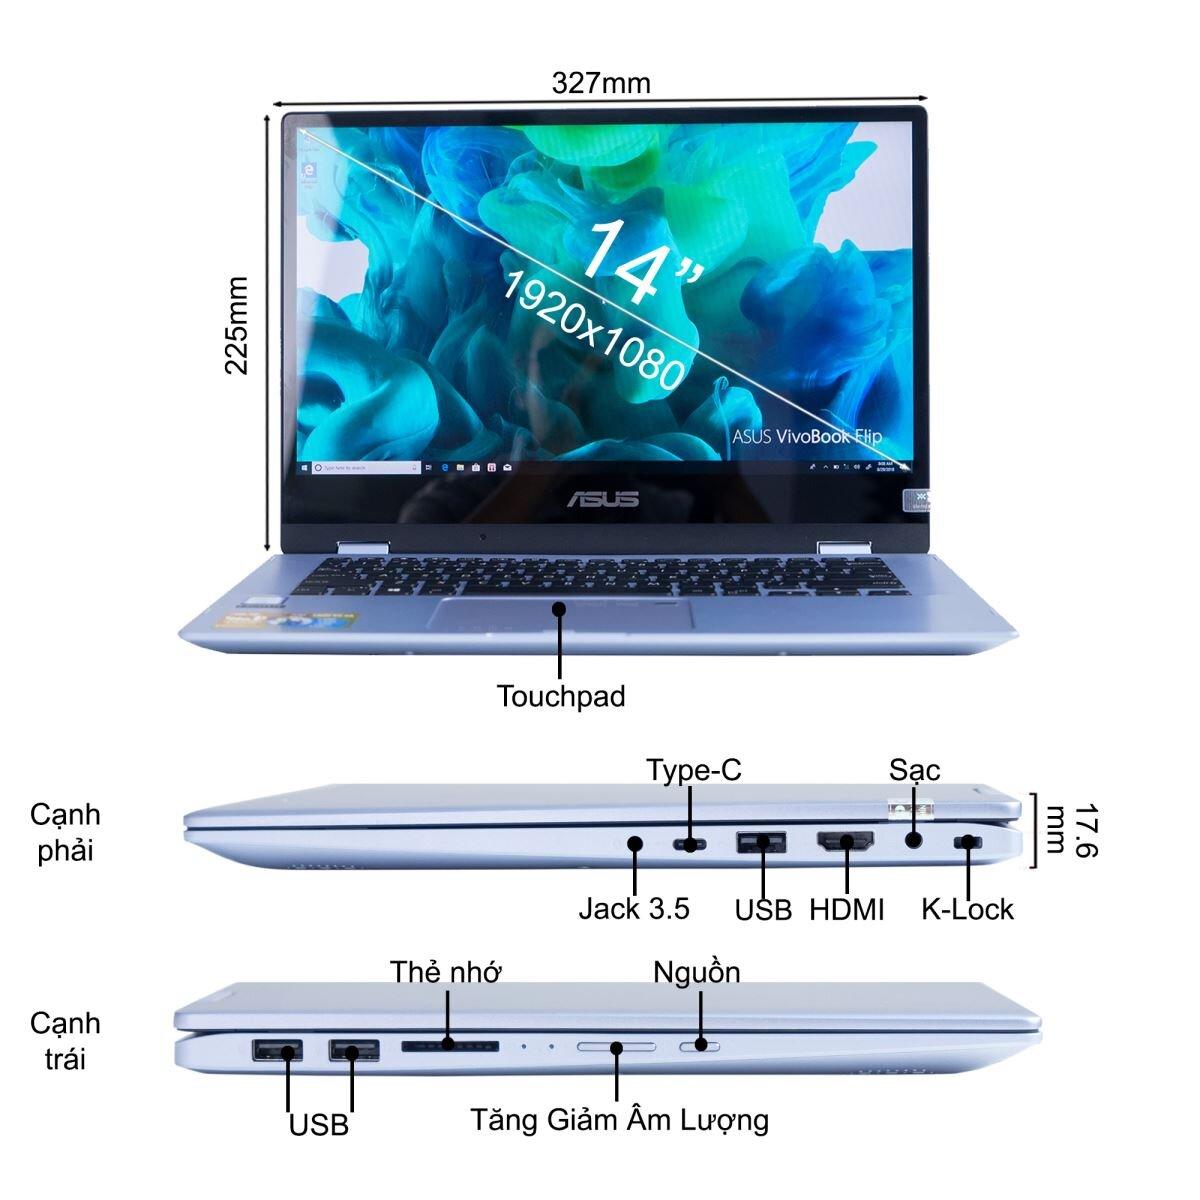 Laptop Asus Vivobook Flip TP412UA-EC173T nhiều tính năng